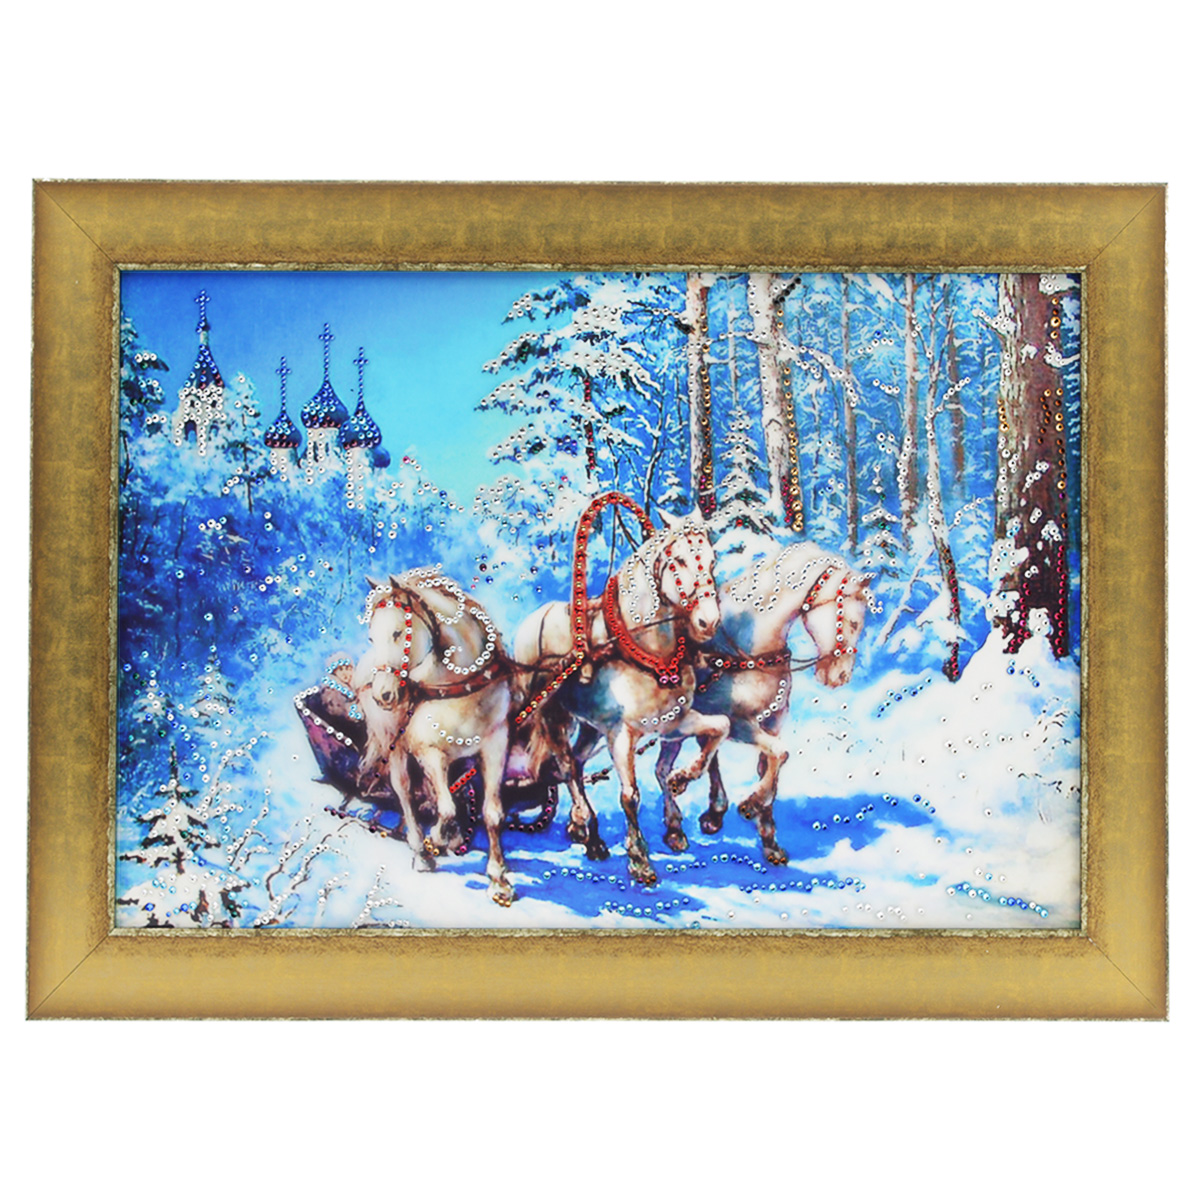 Картина с кристаллами Swarovski Тройка, 70 х 50 см картины в квартиру картина etude 2 102х130 см